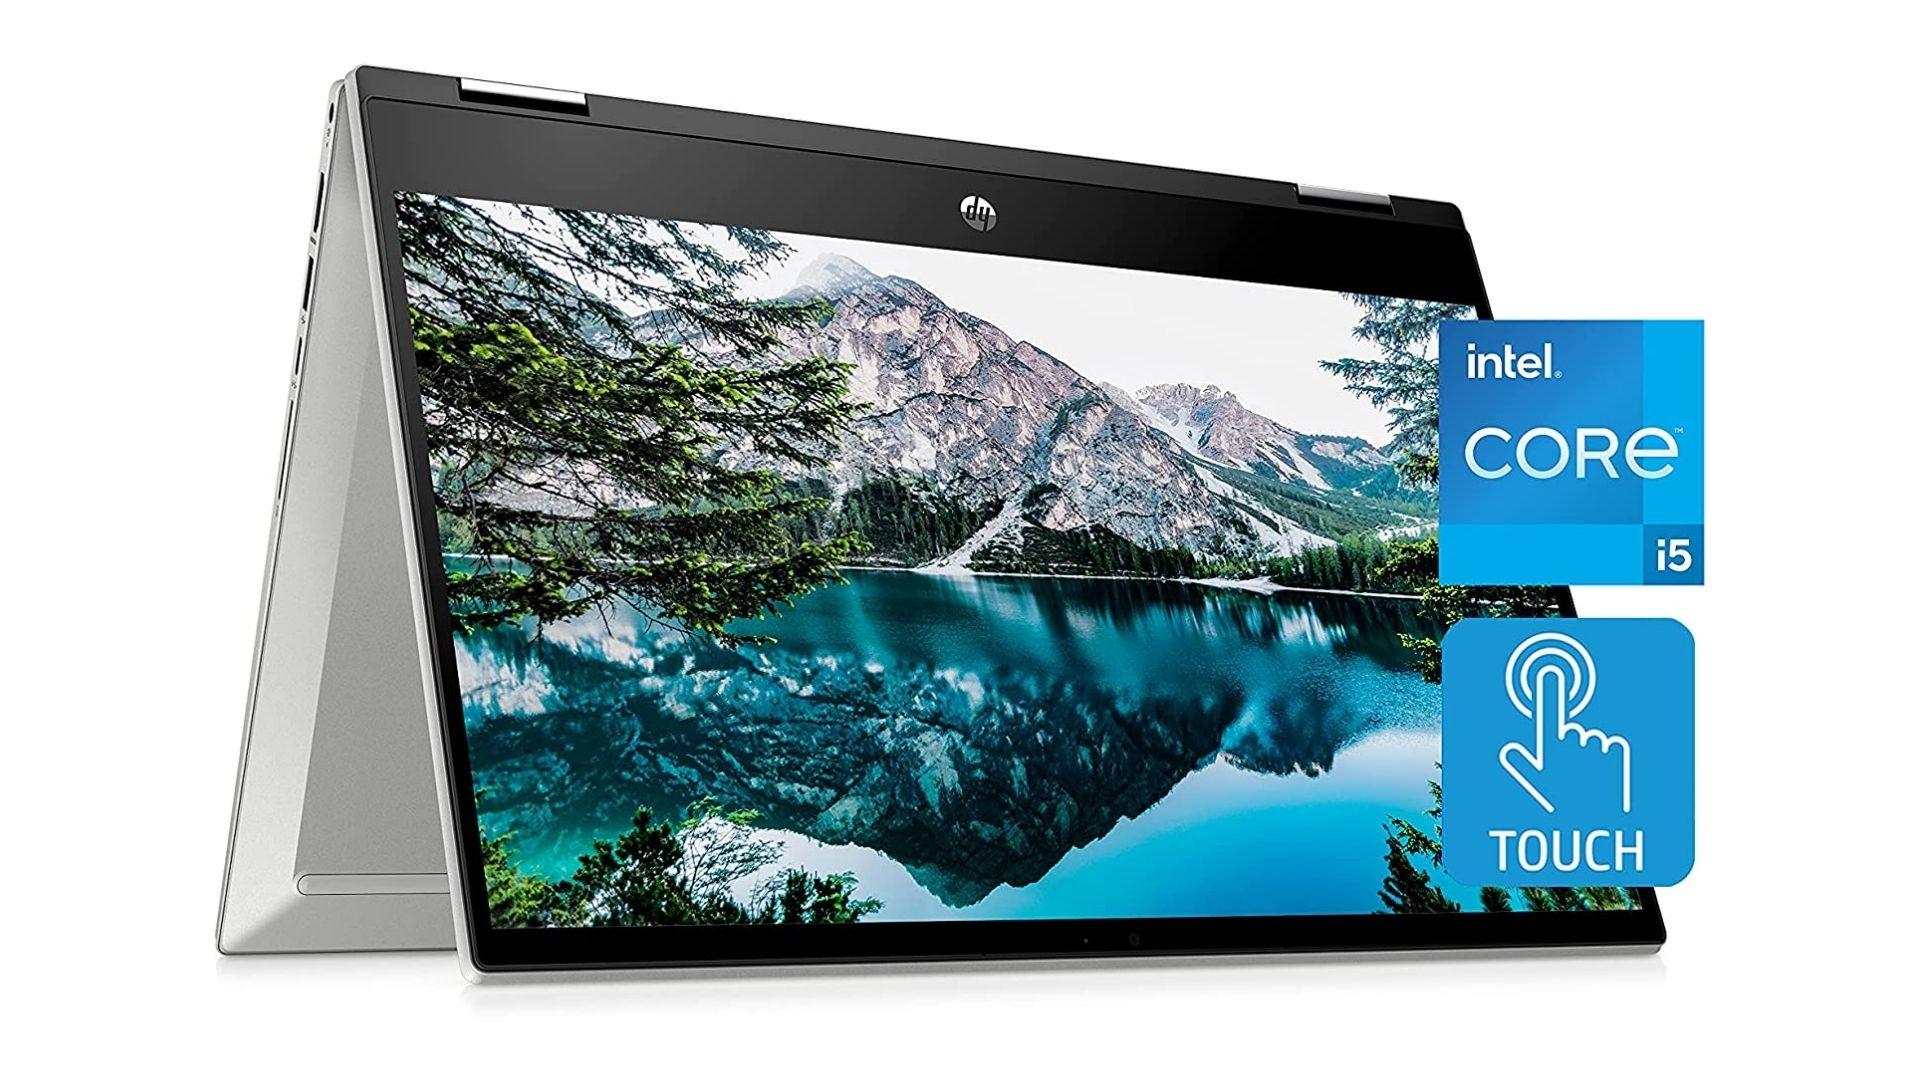 HP Pavilion x360 14 Inch Touchscreen Laptop